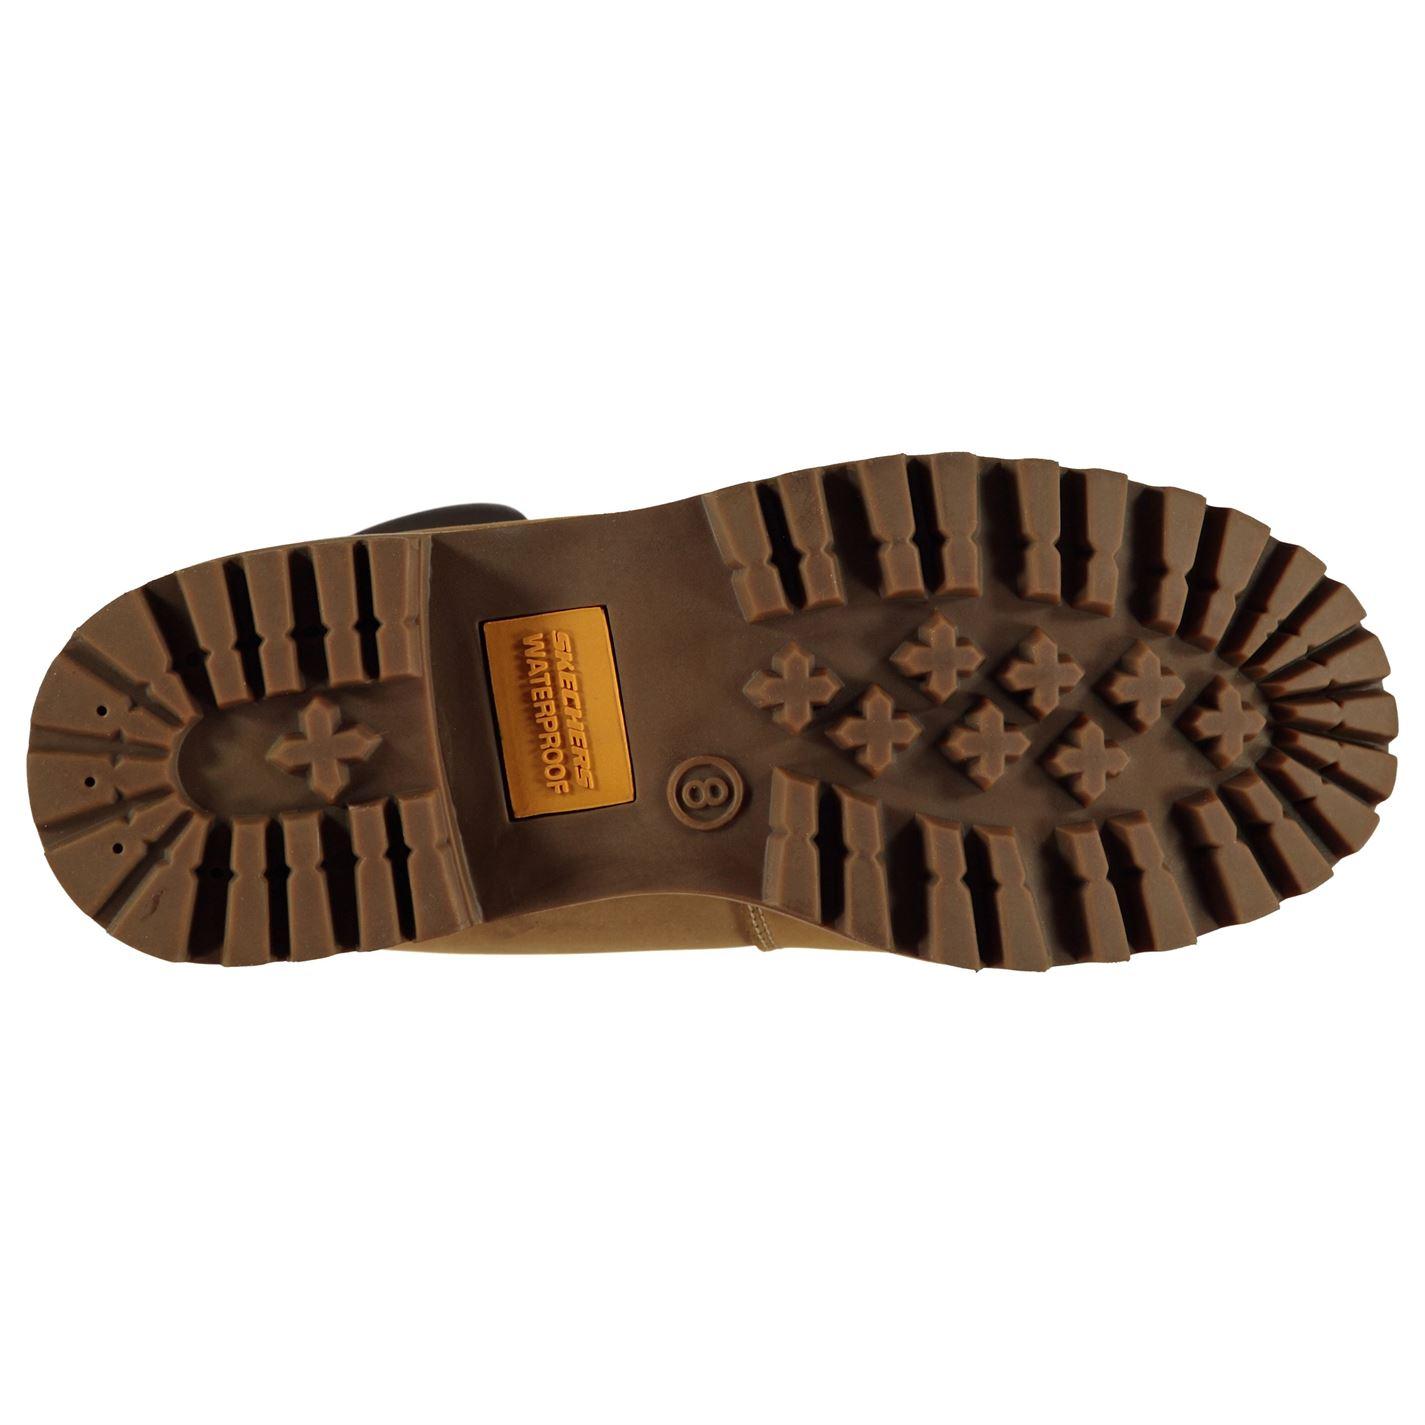 Zapatos Caballeros Veredicto Hombres Sujetados los Cordones Skechers Botas Agua días Usa Todos Desierto n1xO8aq